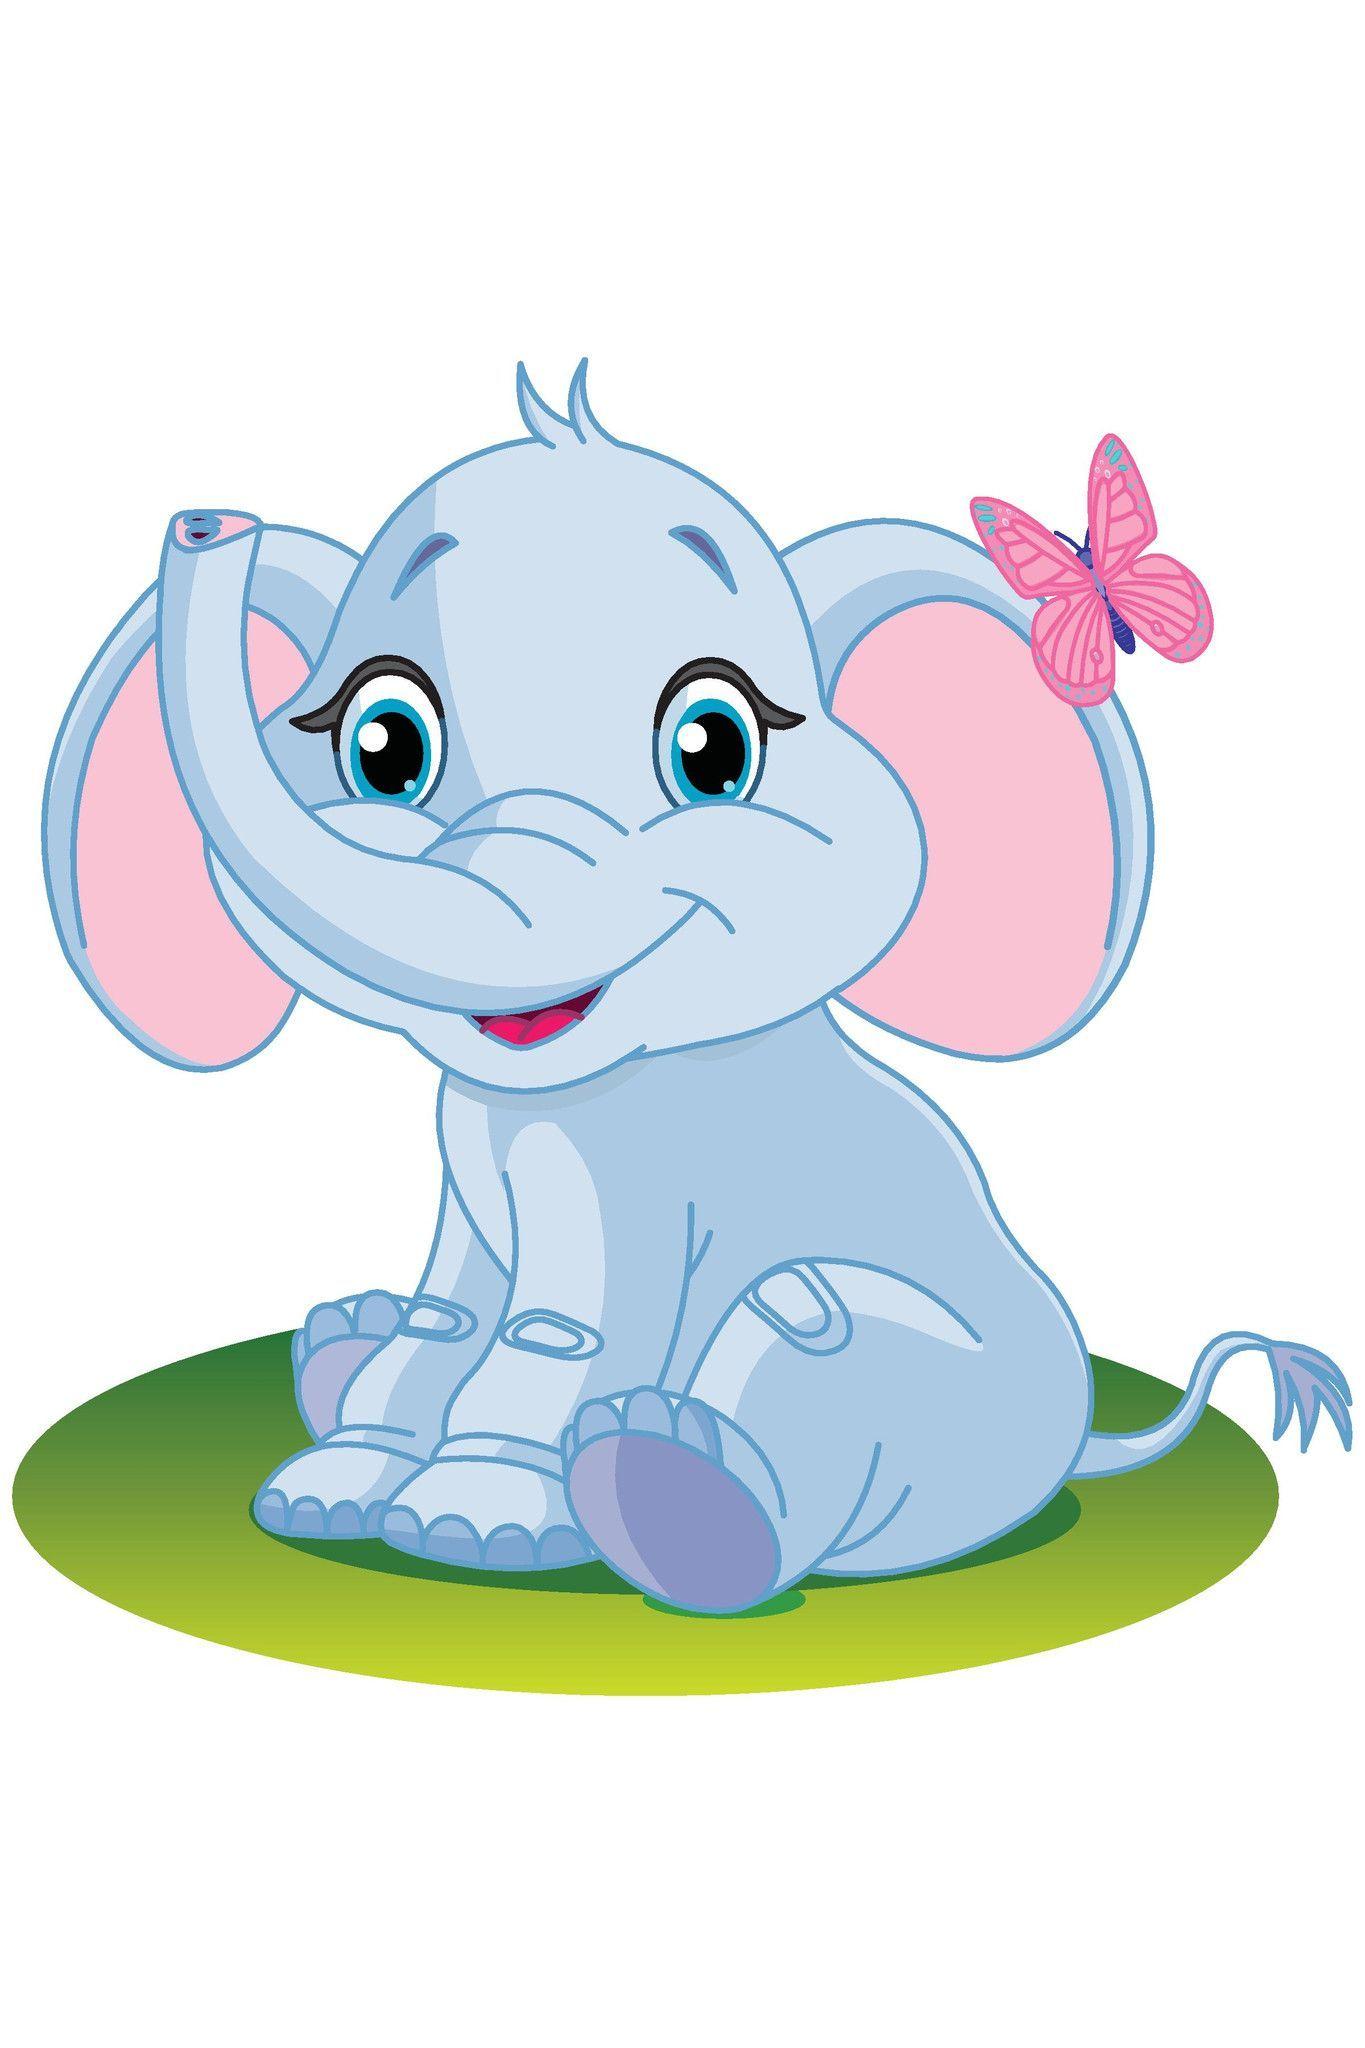 Roam clipart picture royalty free download Elephant Decoration Panel | children clip art | Cute baby ... picture royalty free download